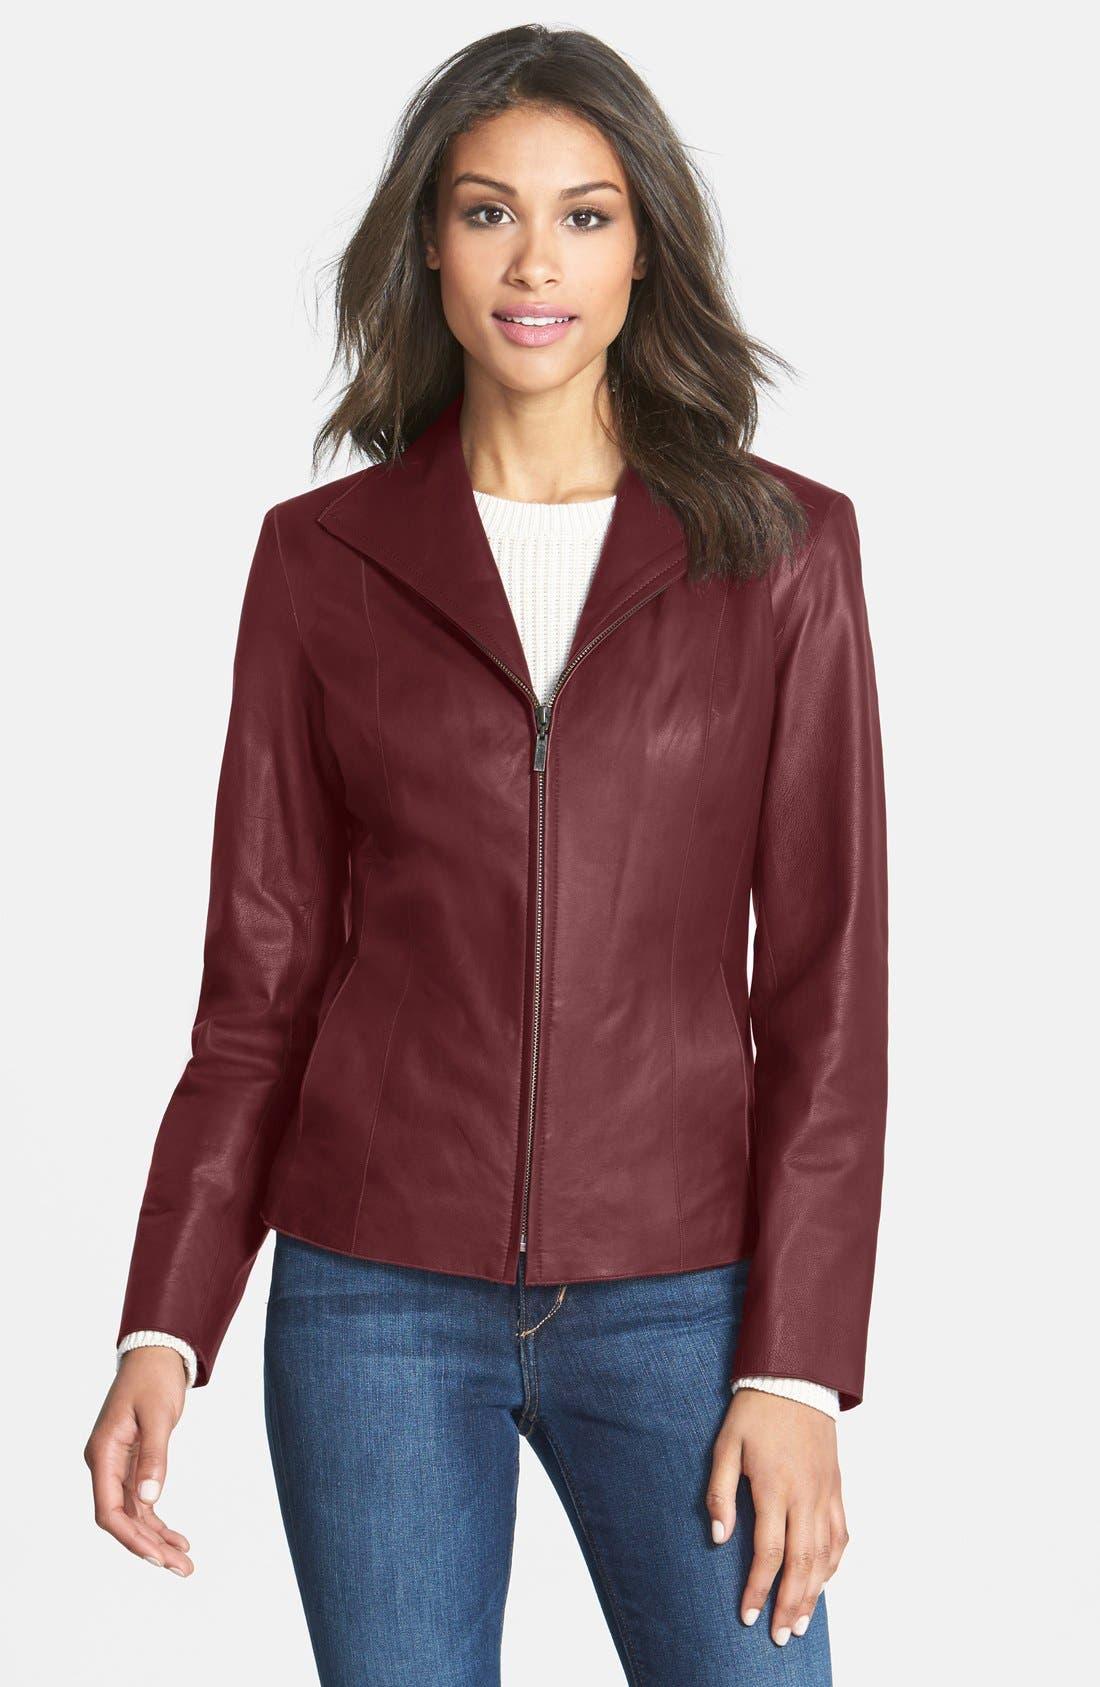 Women's Leather (Genuine) Jackets Sale   Coats & Outerwear ...